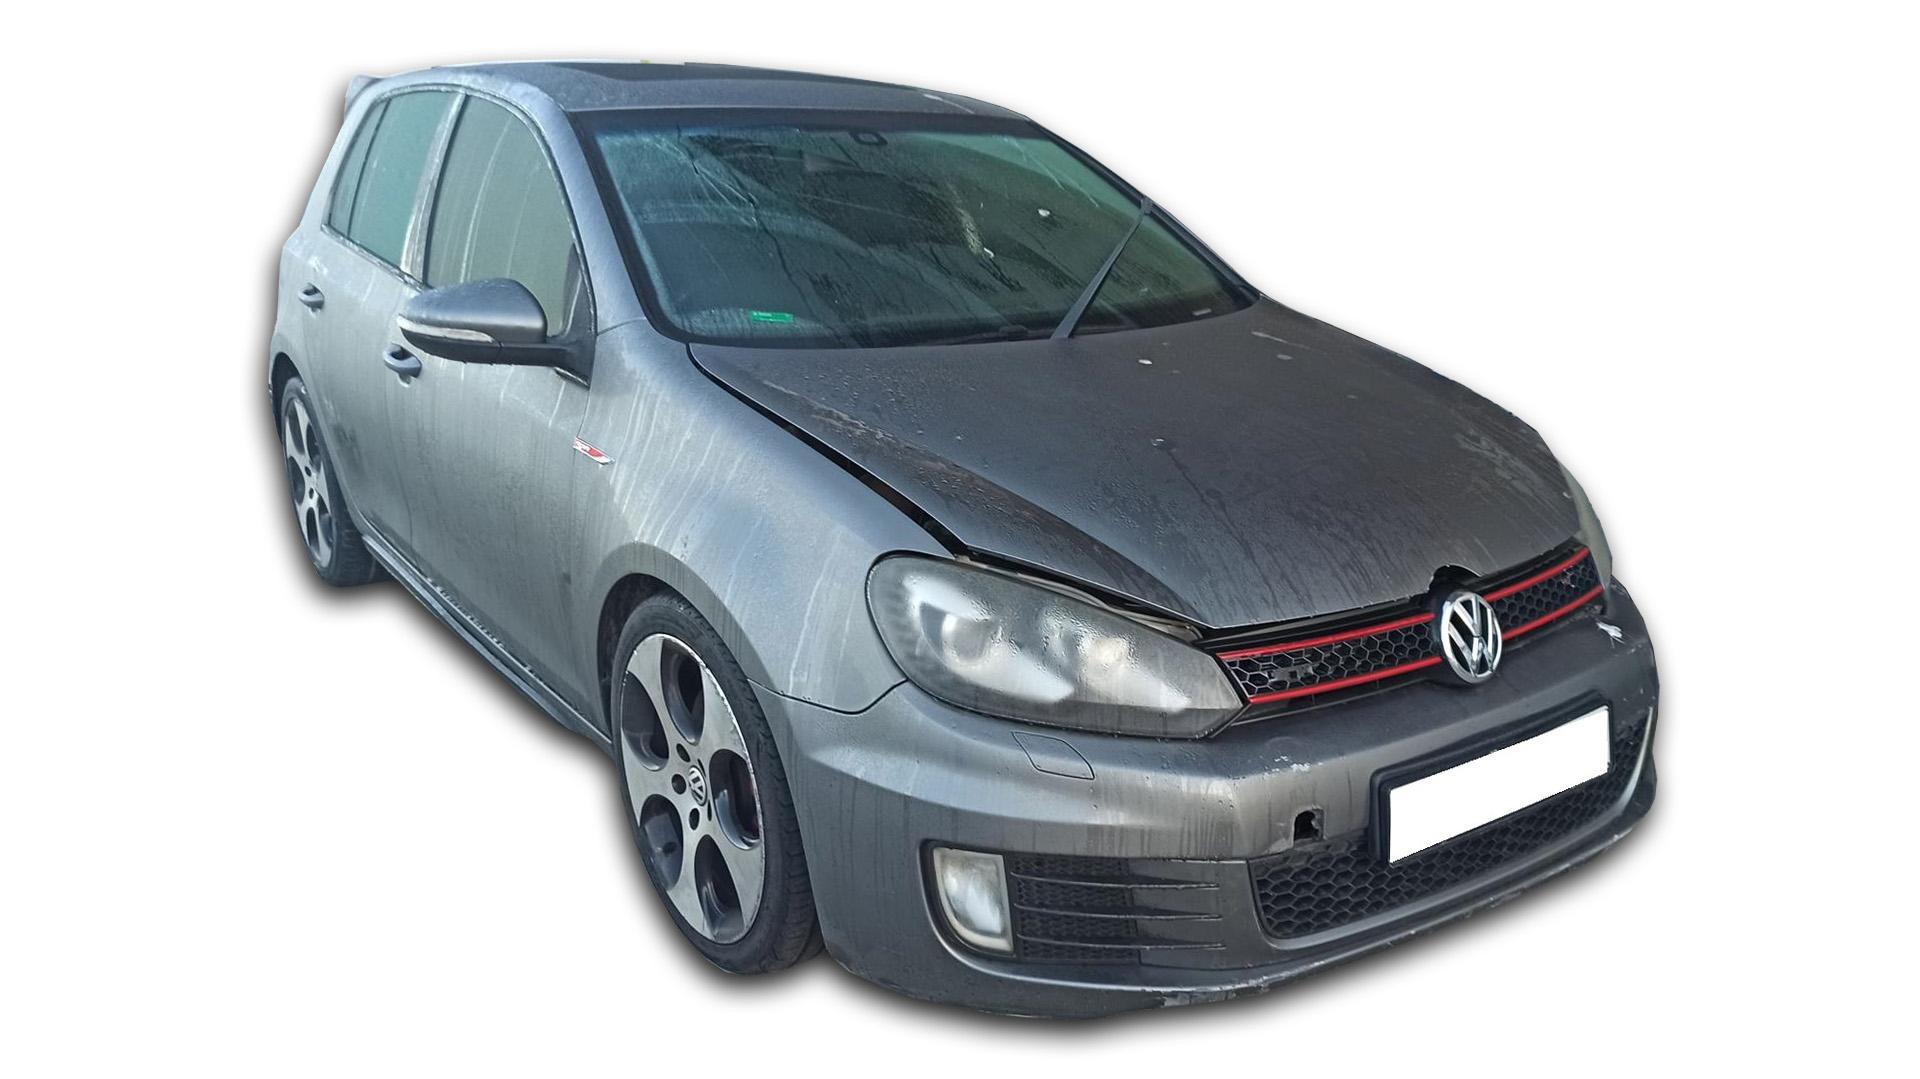 VW Golf 6 Gti 2.0 Tsi